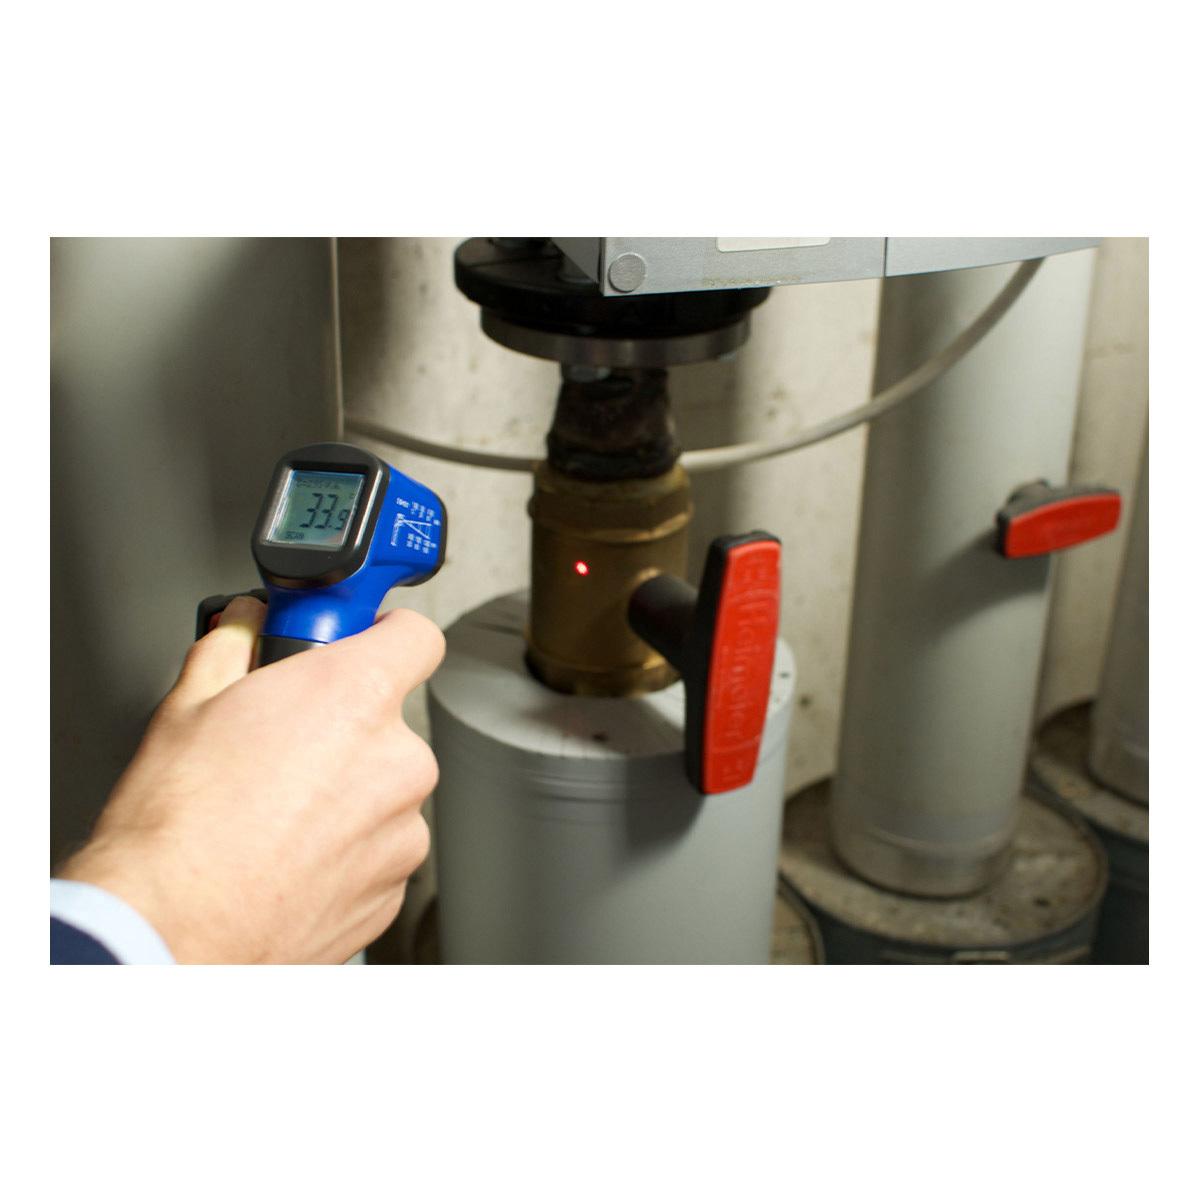 31-1134-06-infrarot-thermometer-scantemp-330-anwendung3-1200x1200px.jpg